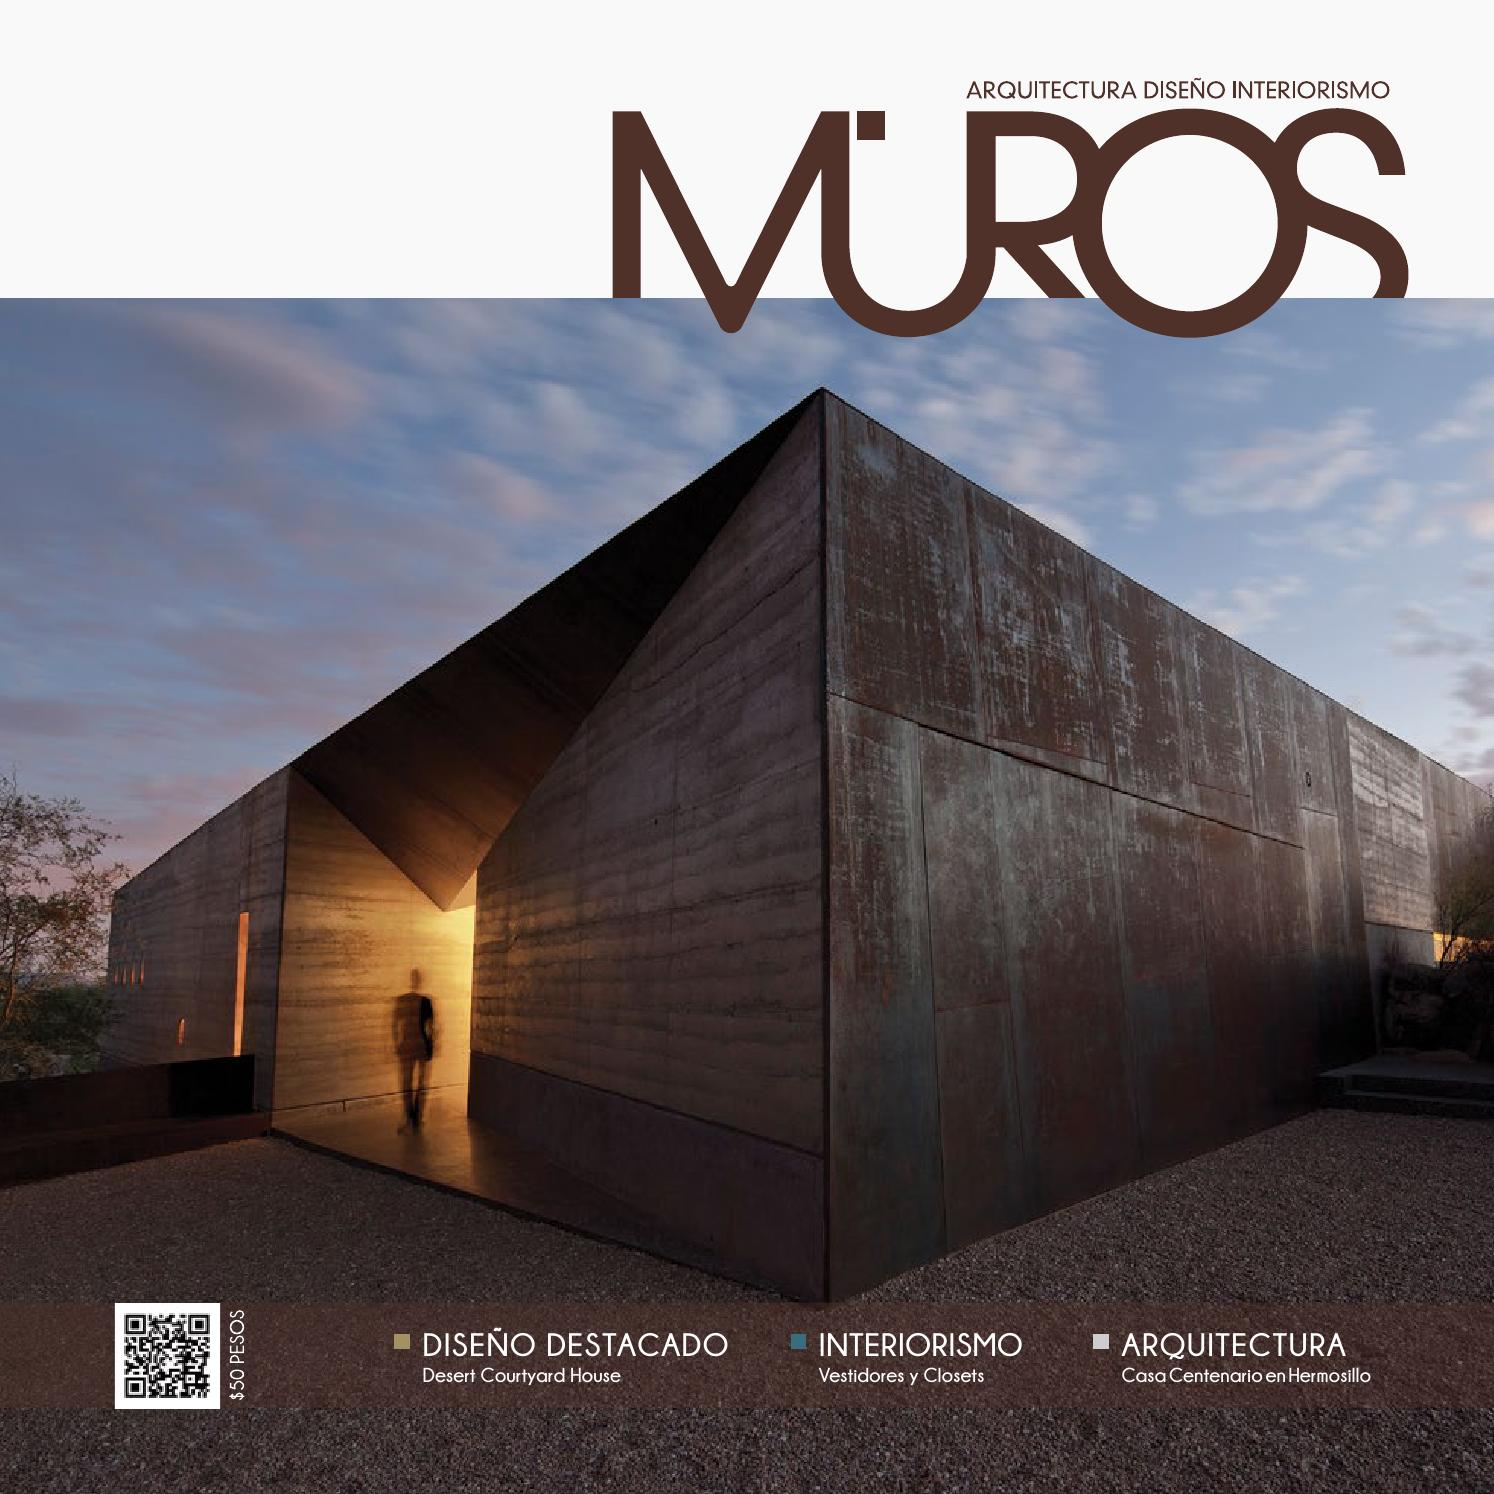 Edici n 16 revista muros arquitectura dise o Arte arquitectura y diseno definicion